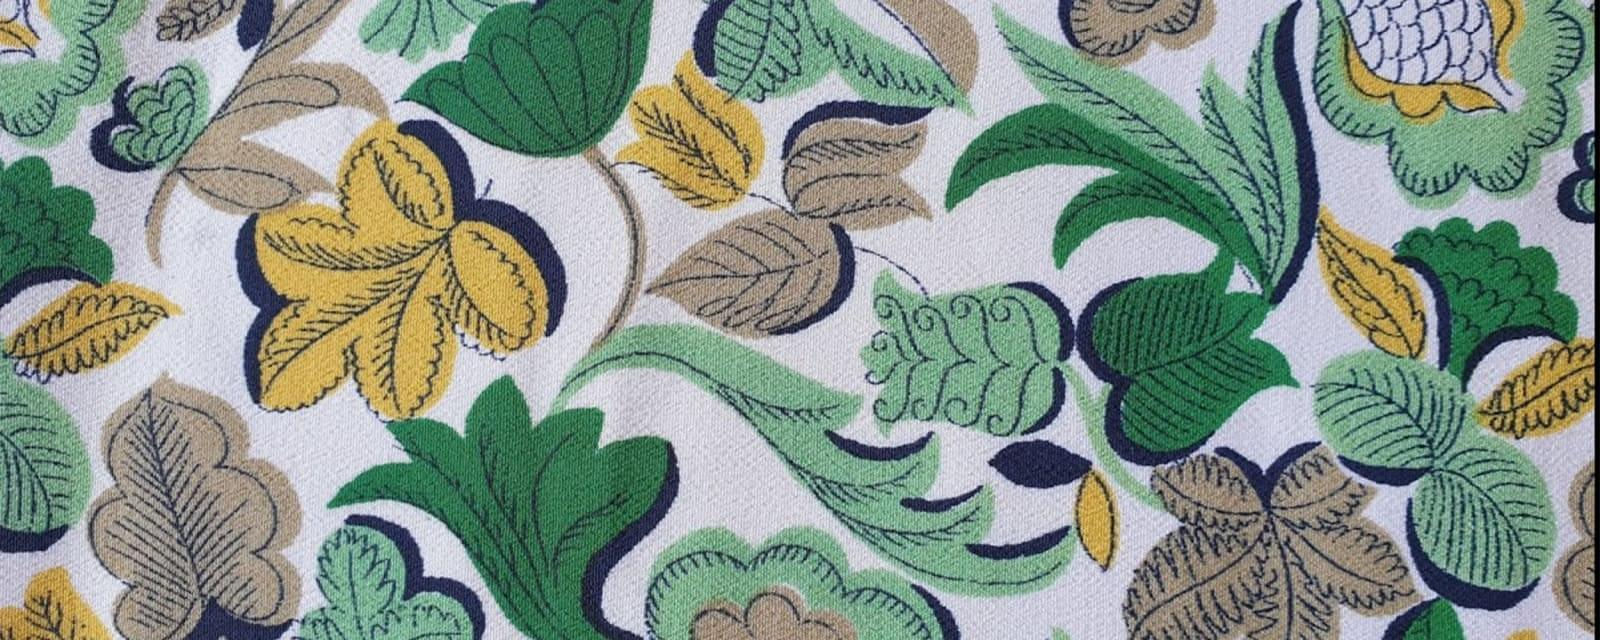 Floral Pattern sample printed on silk